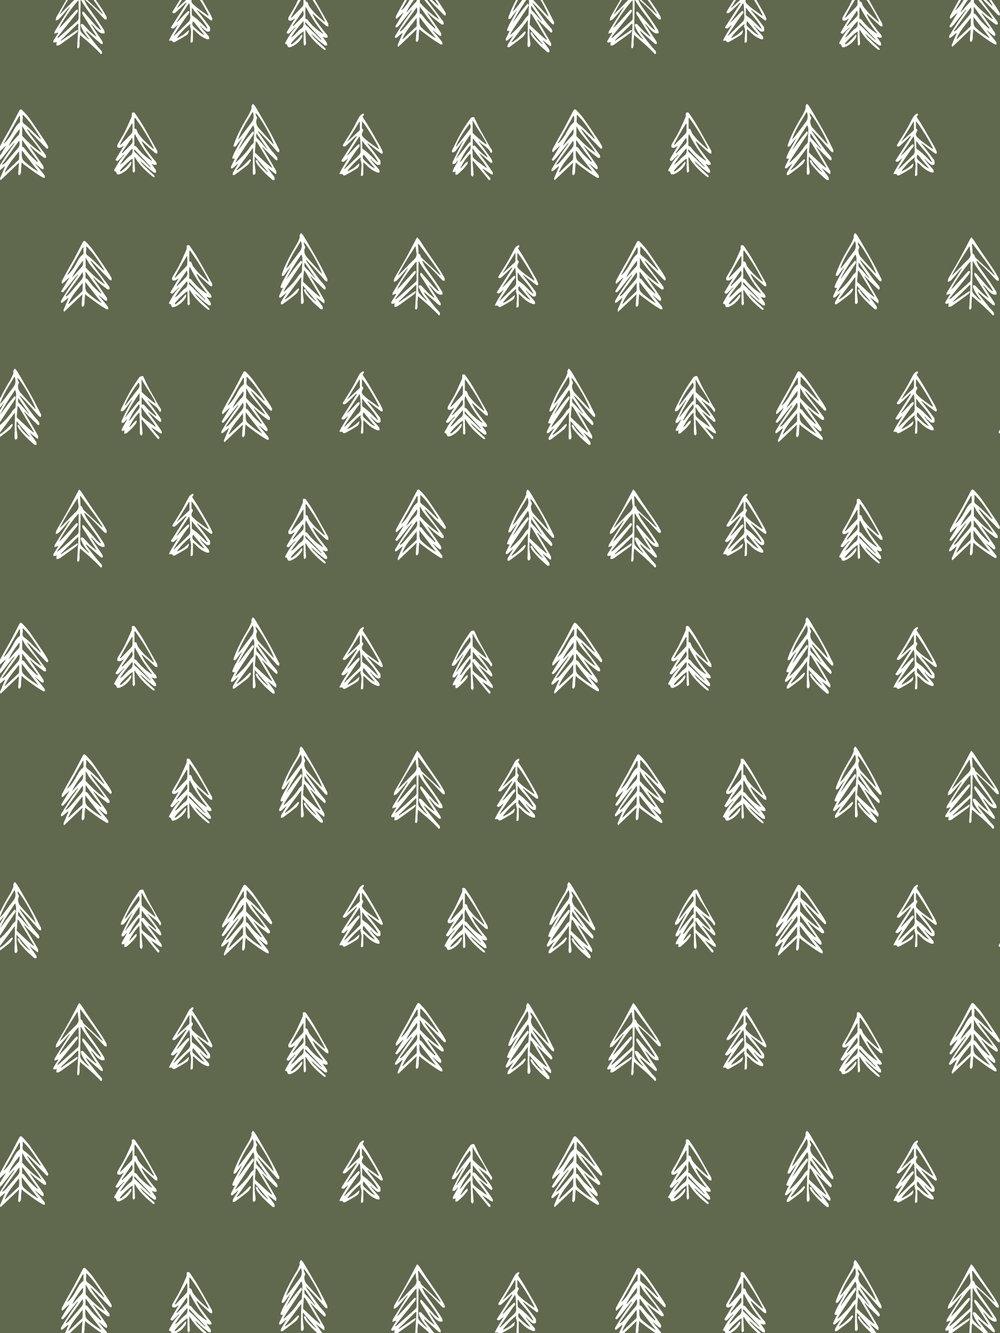 Trees_2-01.jpg